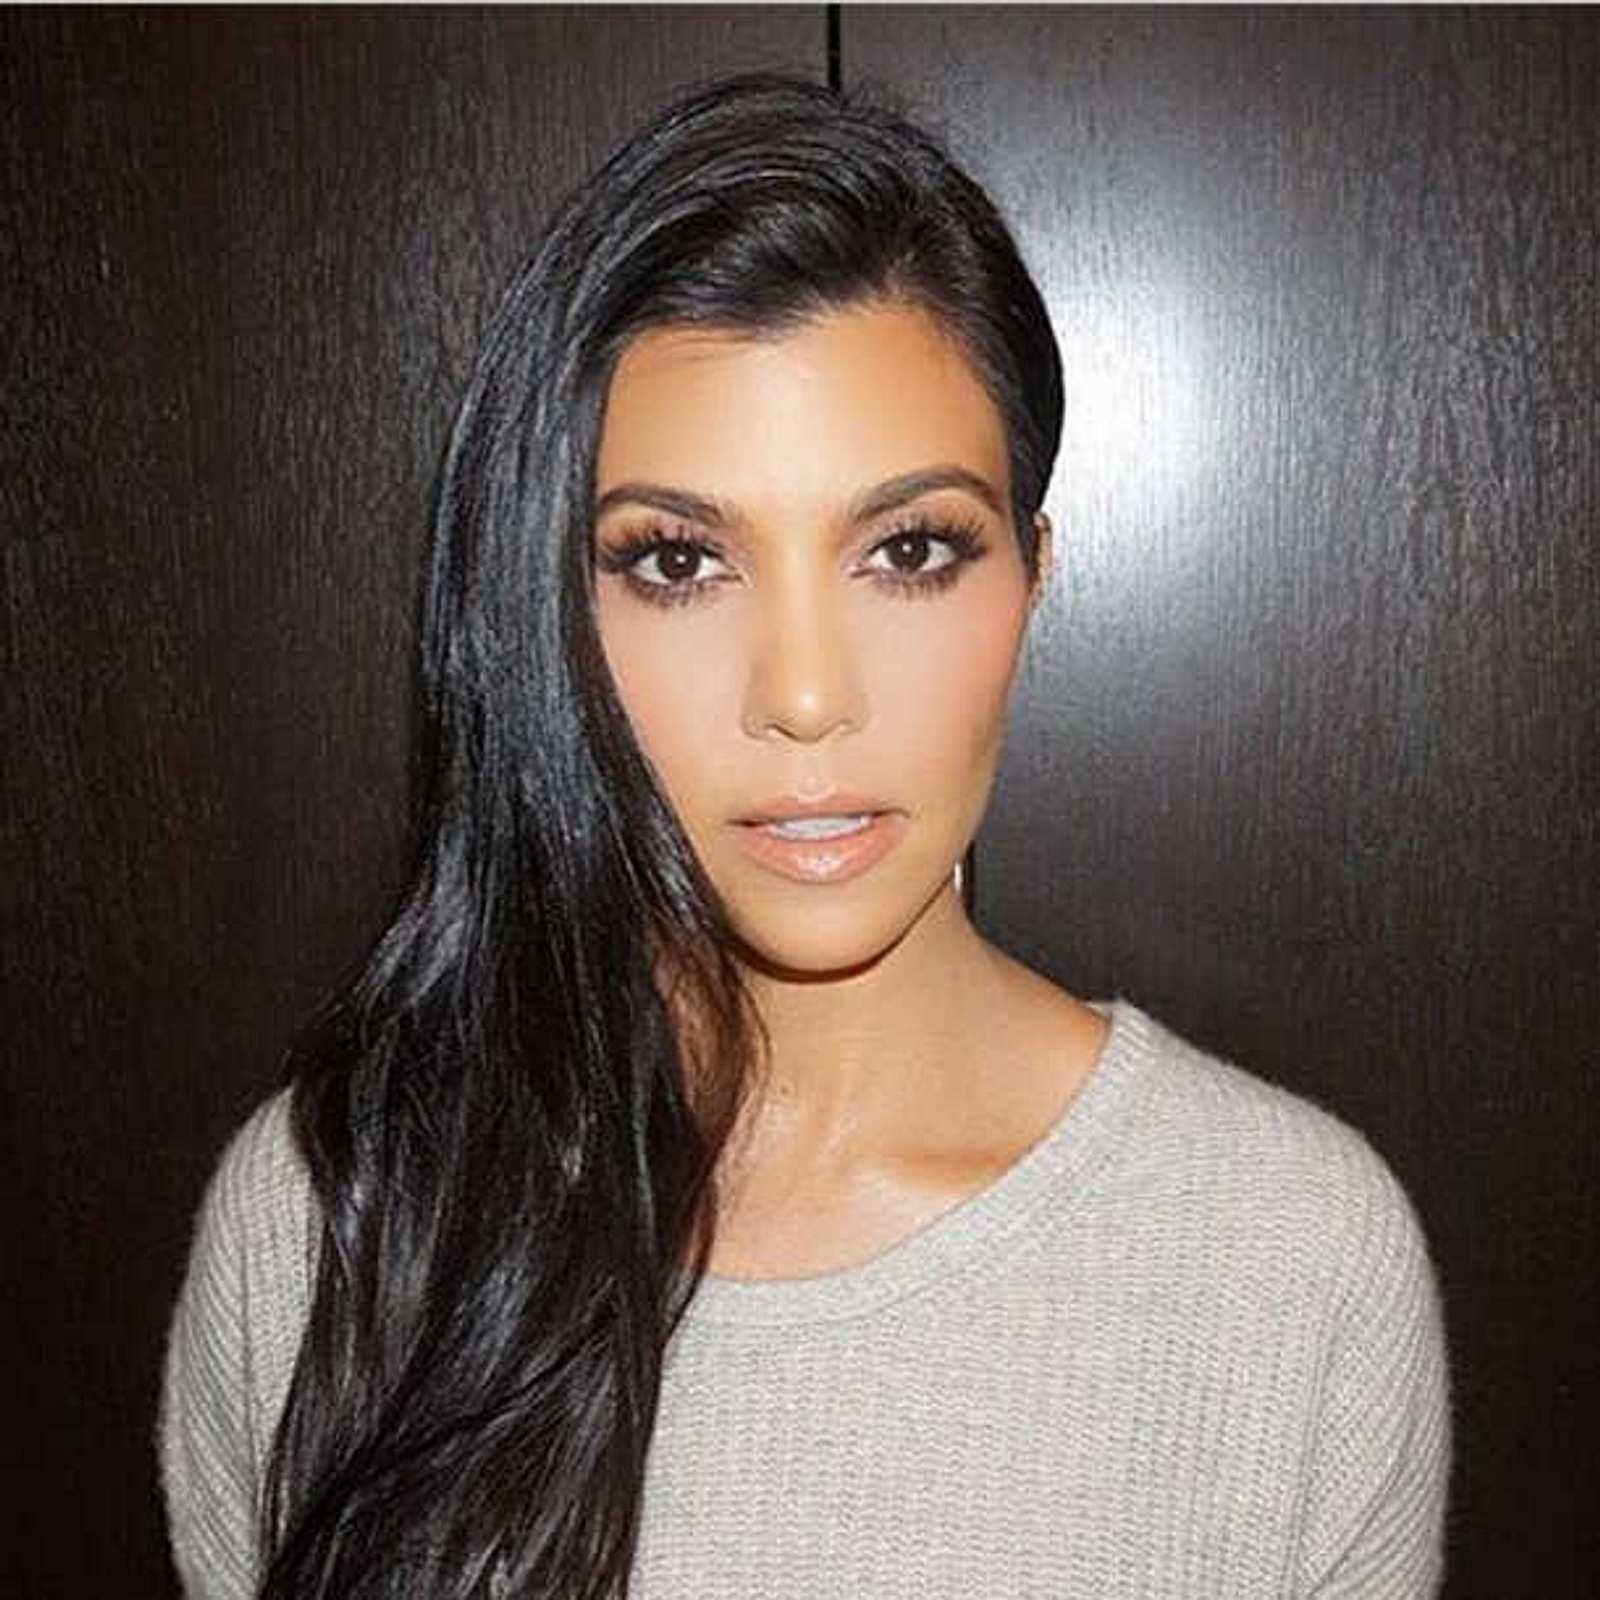 Kourtney Kardashian: Nippel-Blitzer auf Instagram-Foto